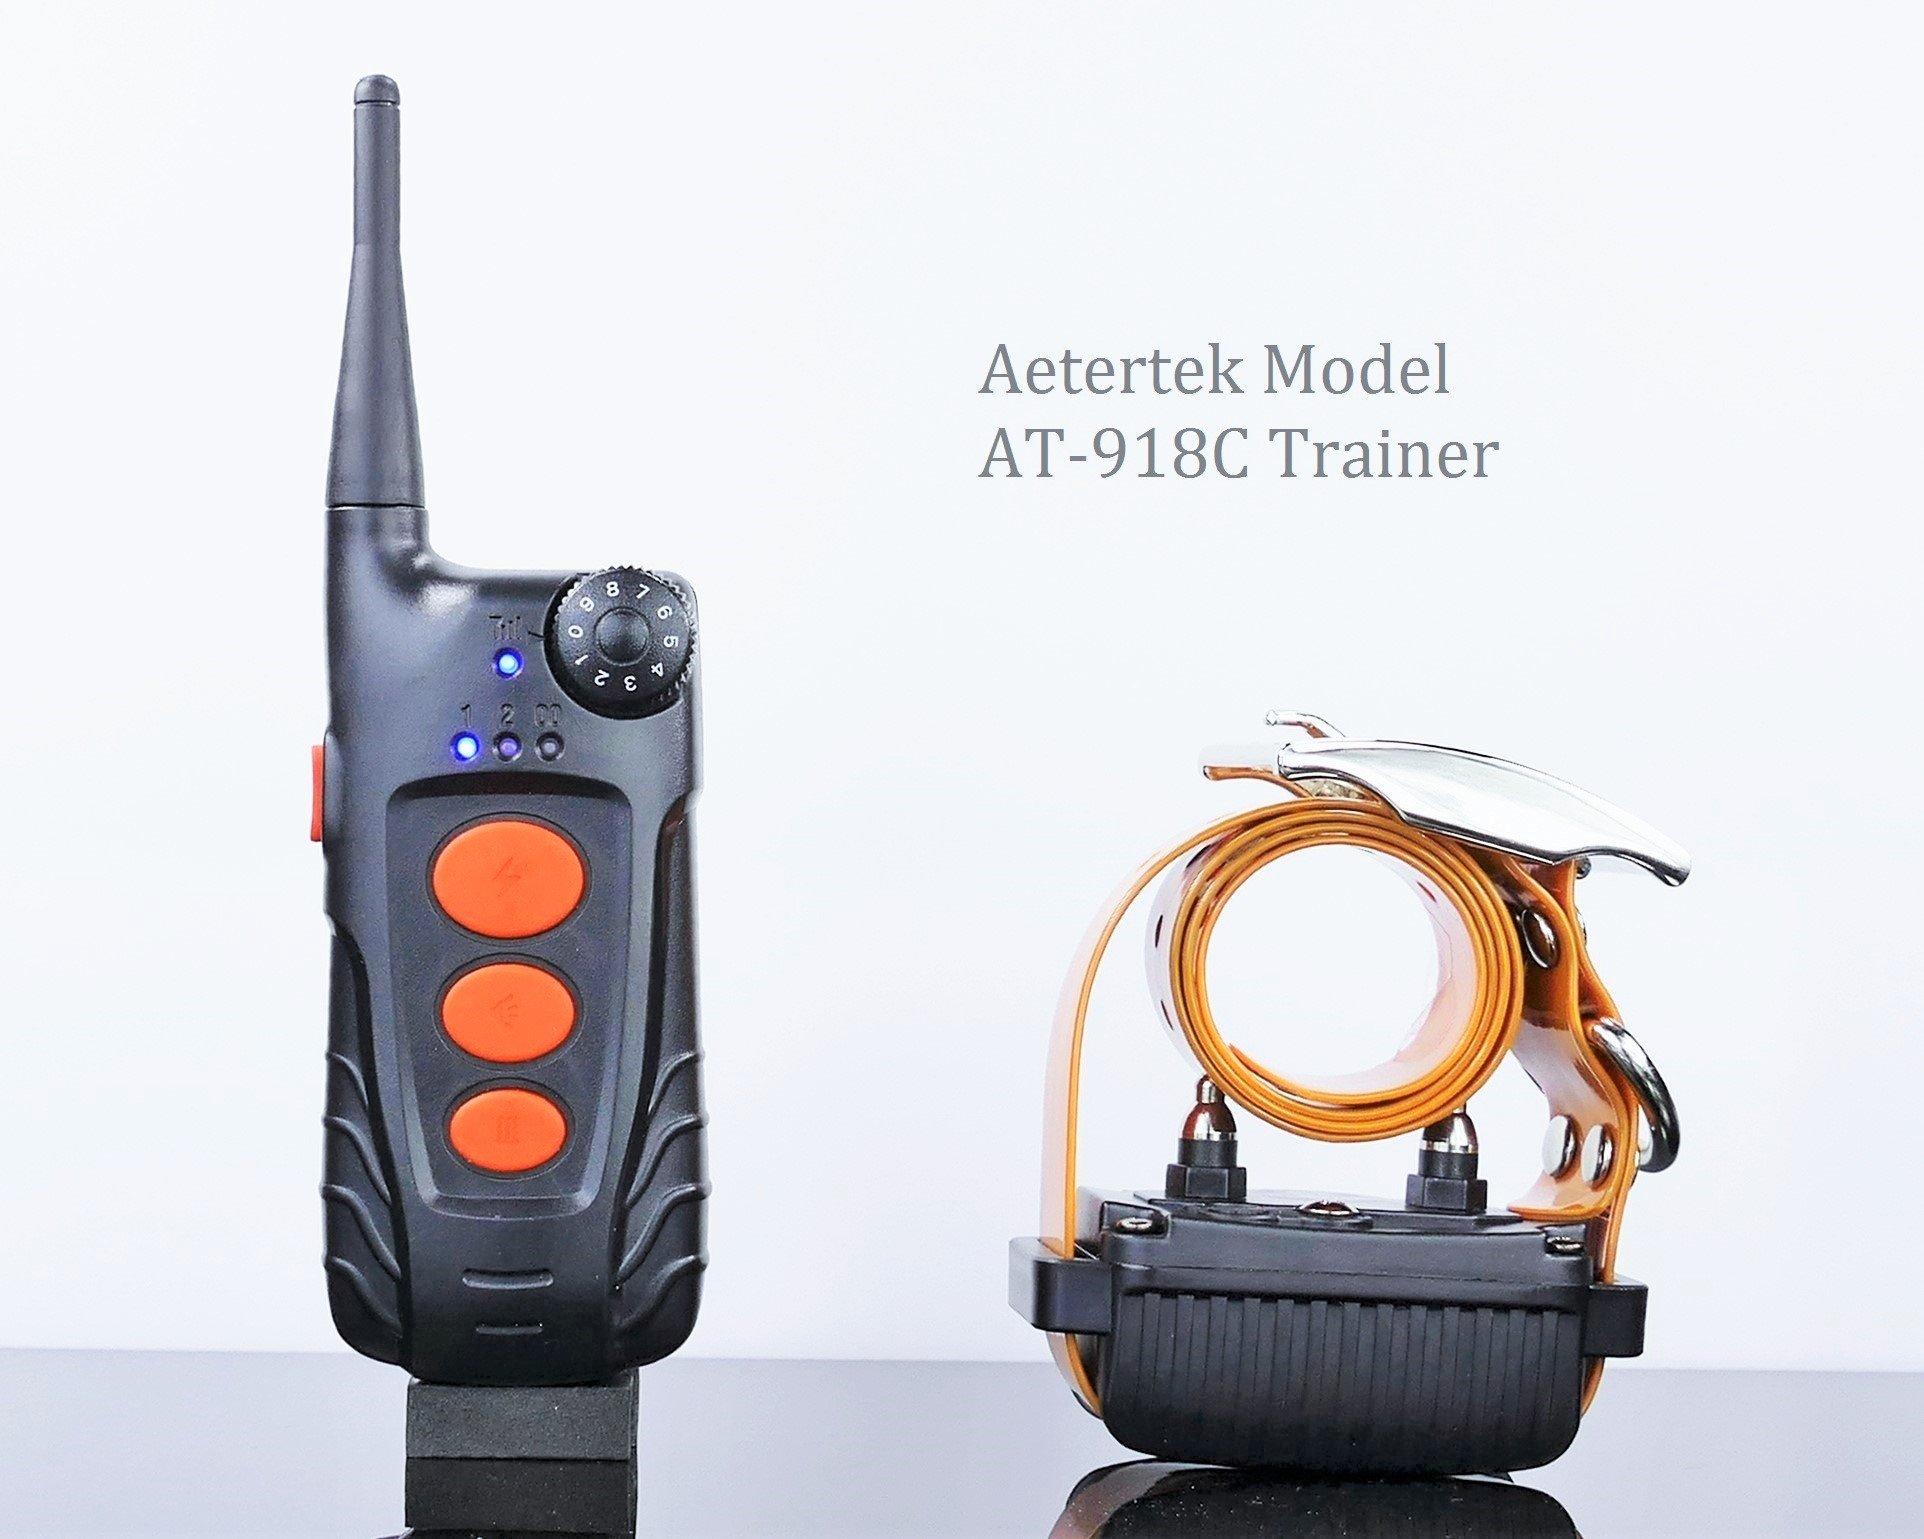 Aetertek 600 Meter Remote Dog Training Collar Rechargeable Waterproof Trainer w/Tone,Vibration,10 Levels of Adjustable Static Stimulation, (One Dog Trainer) by Aetertek